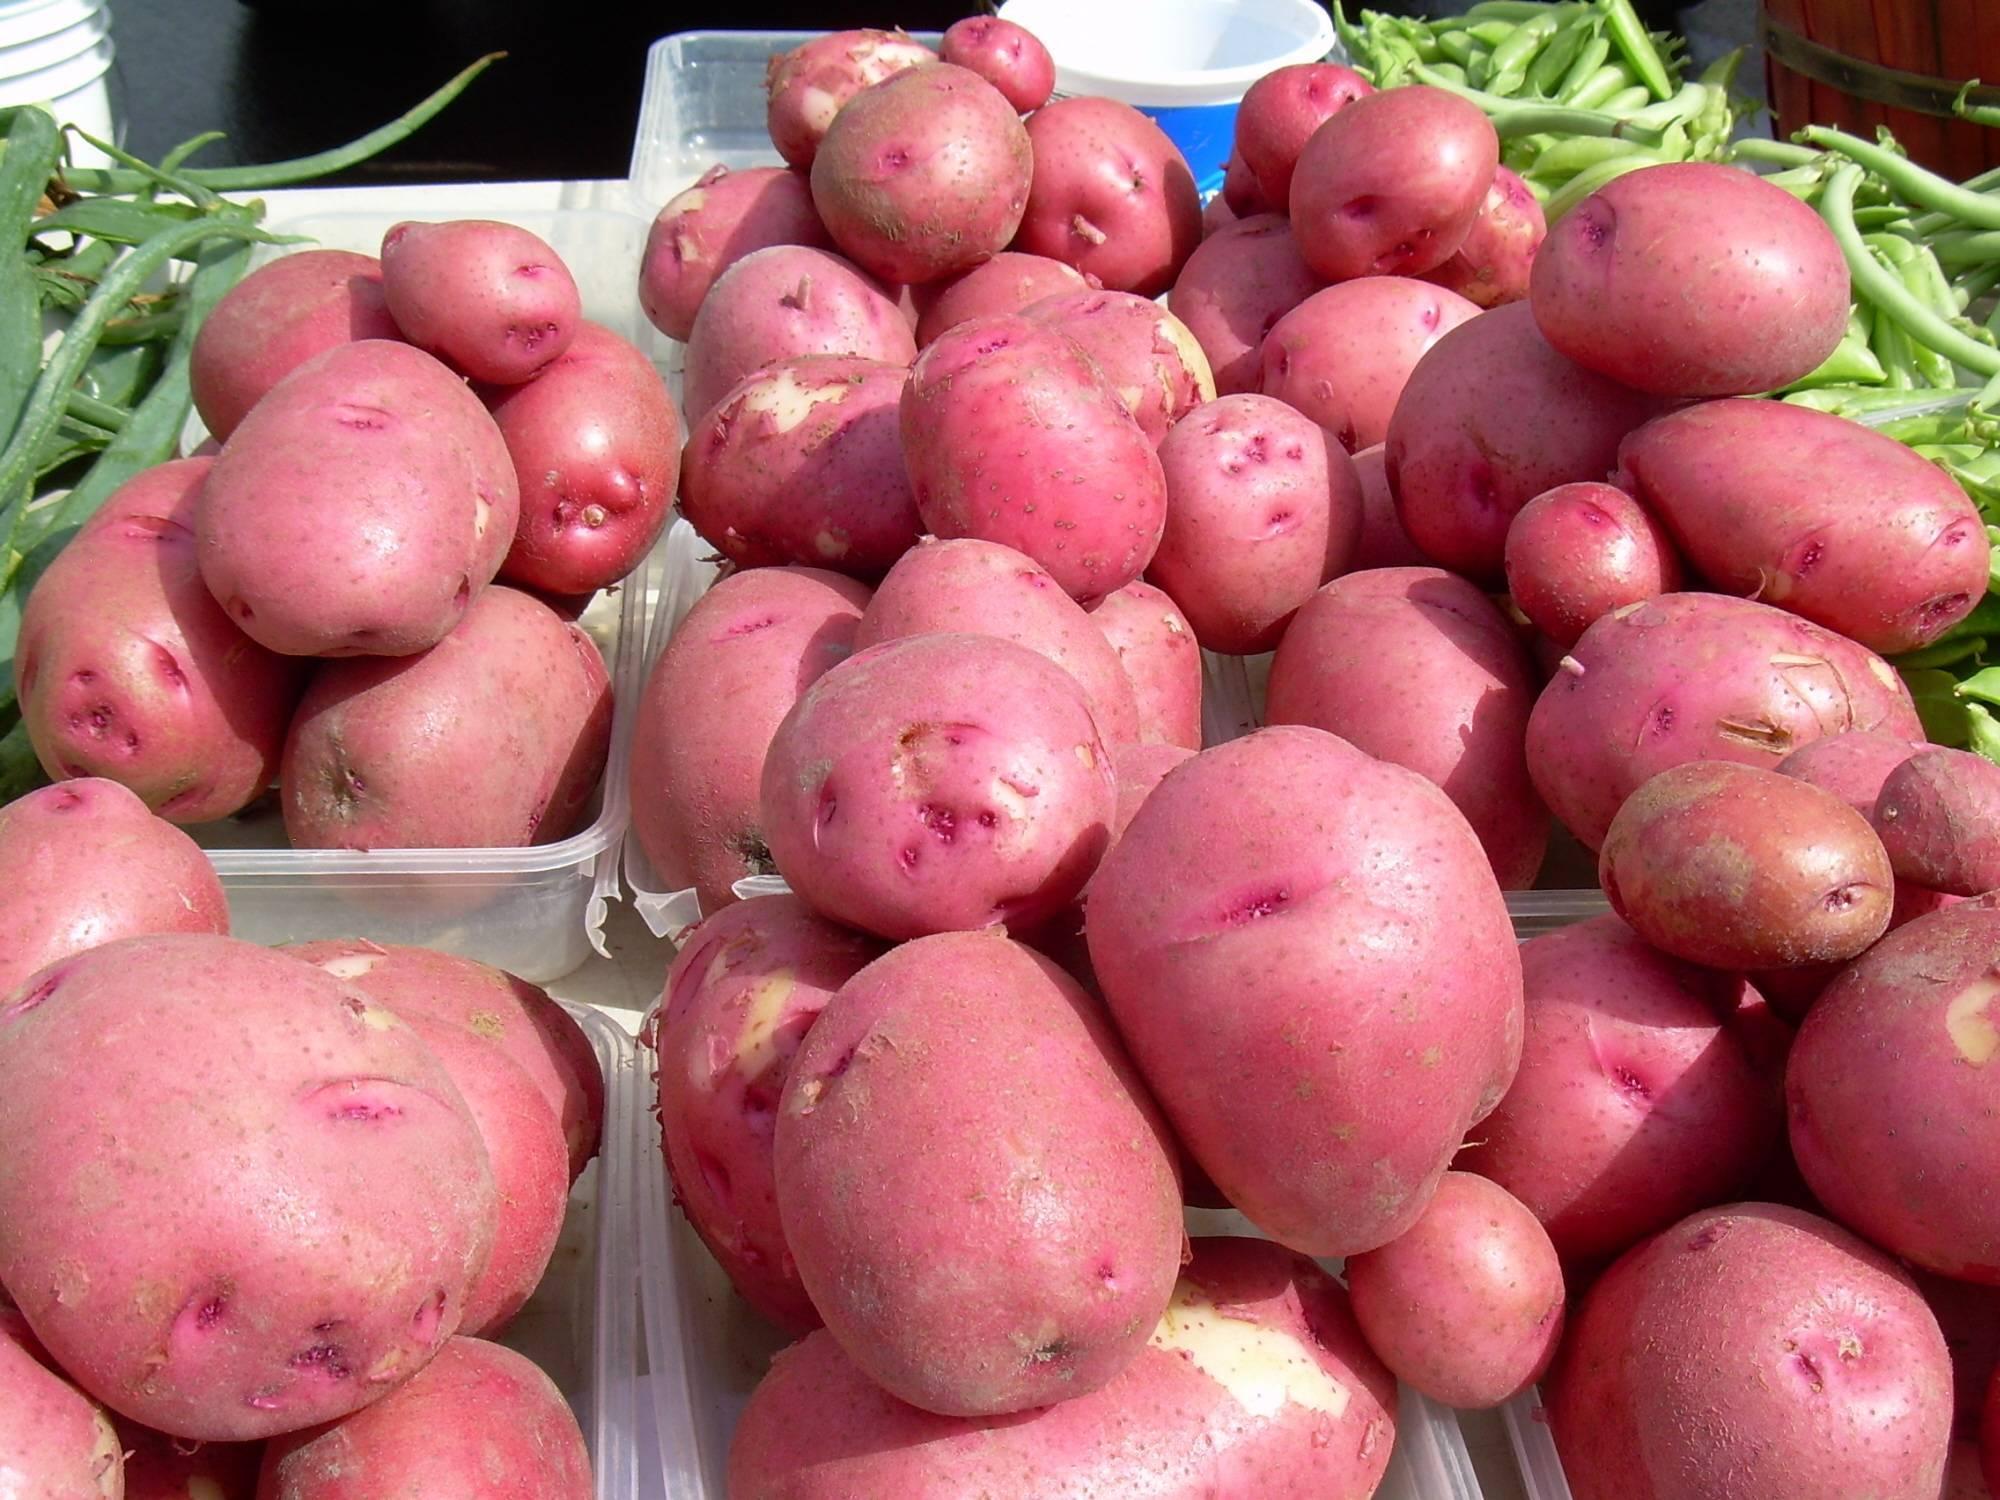 Сорт картофеля ред скарлетт: описание, характеристики, фото